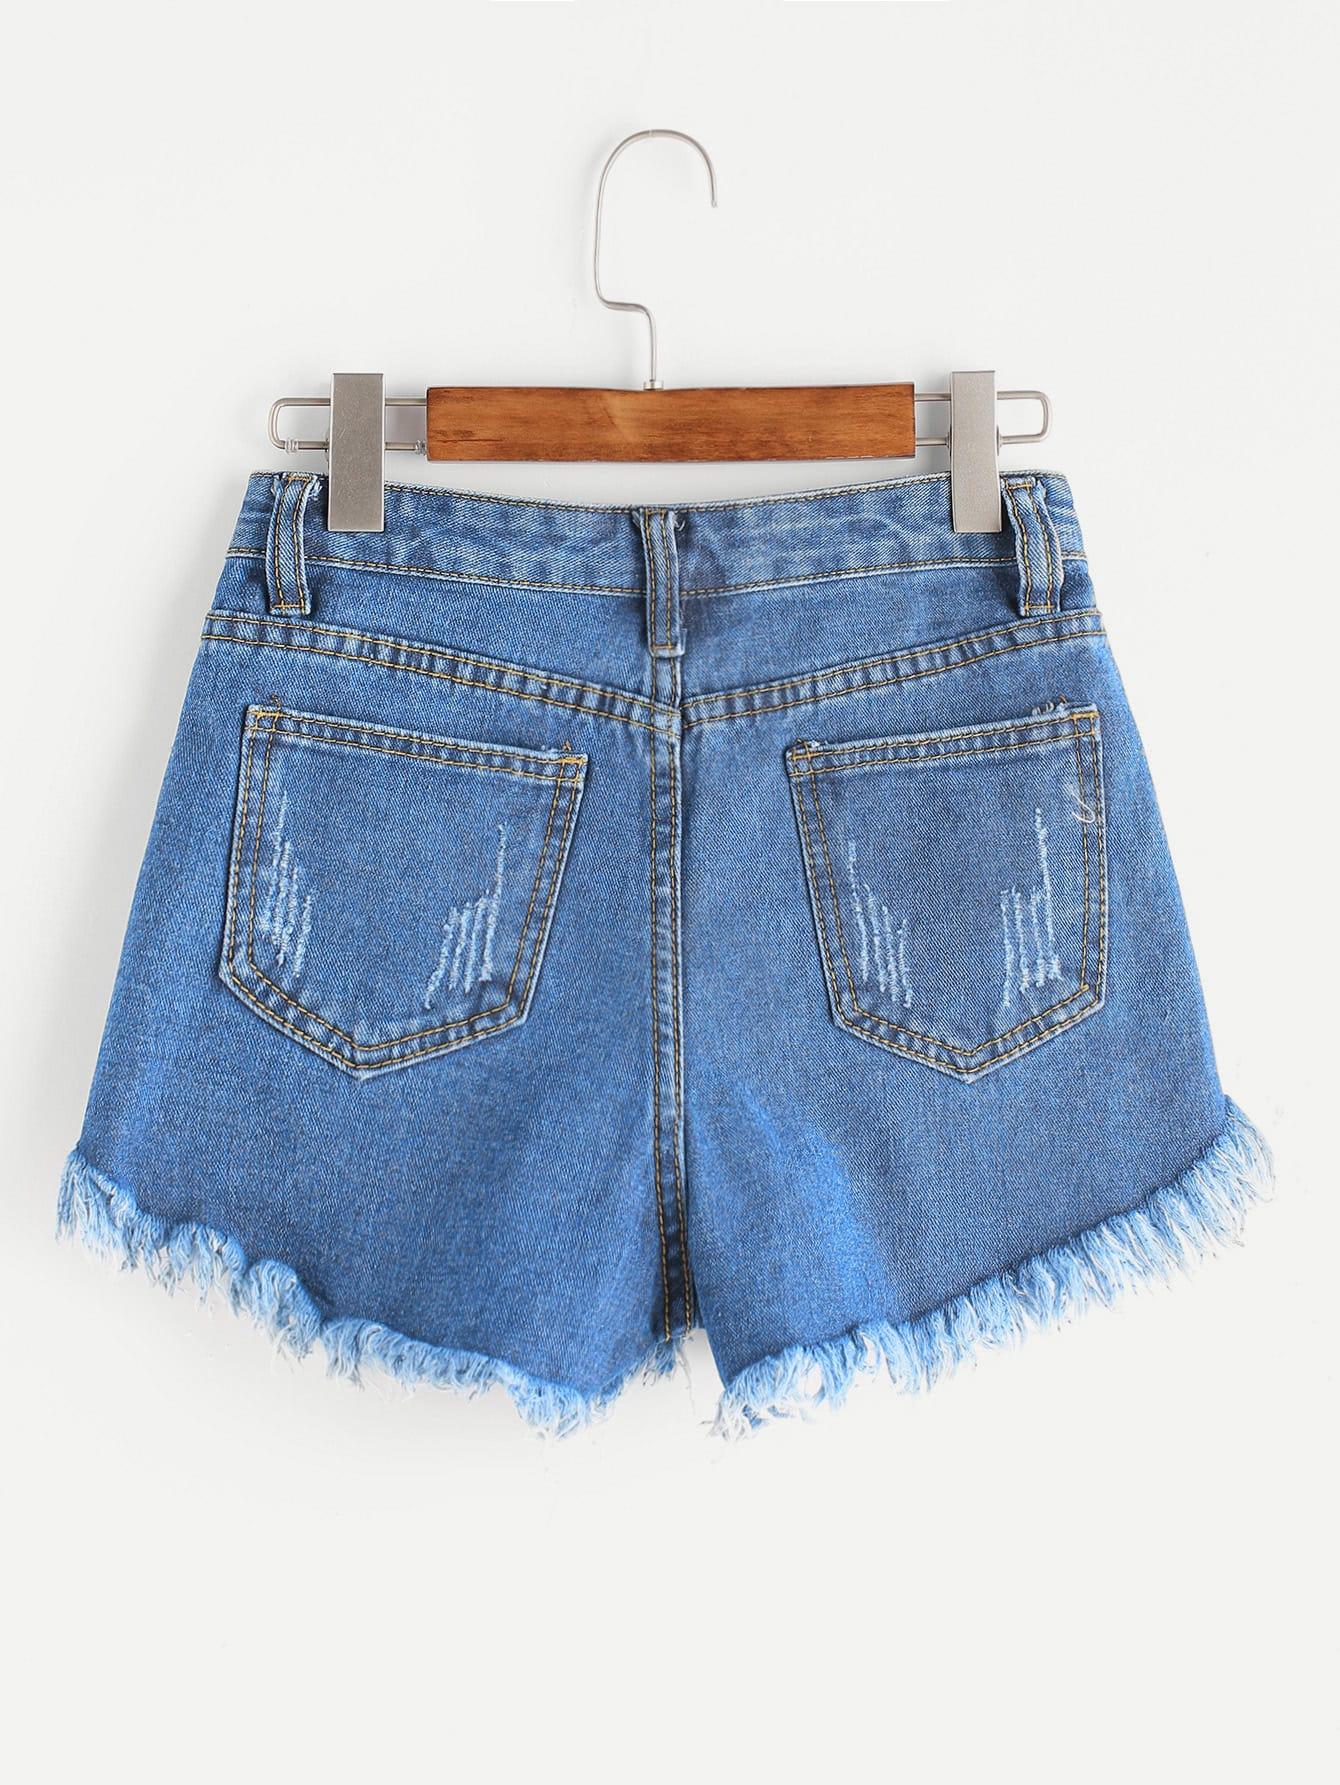 shorts170502001_2